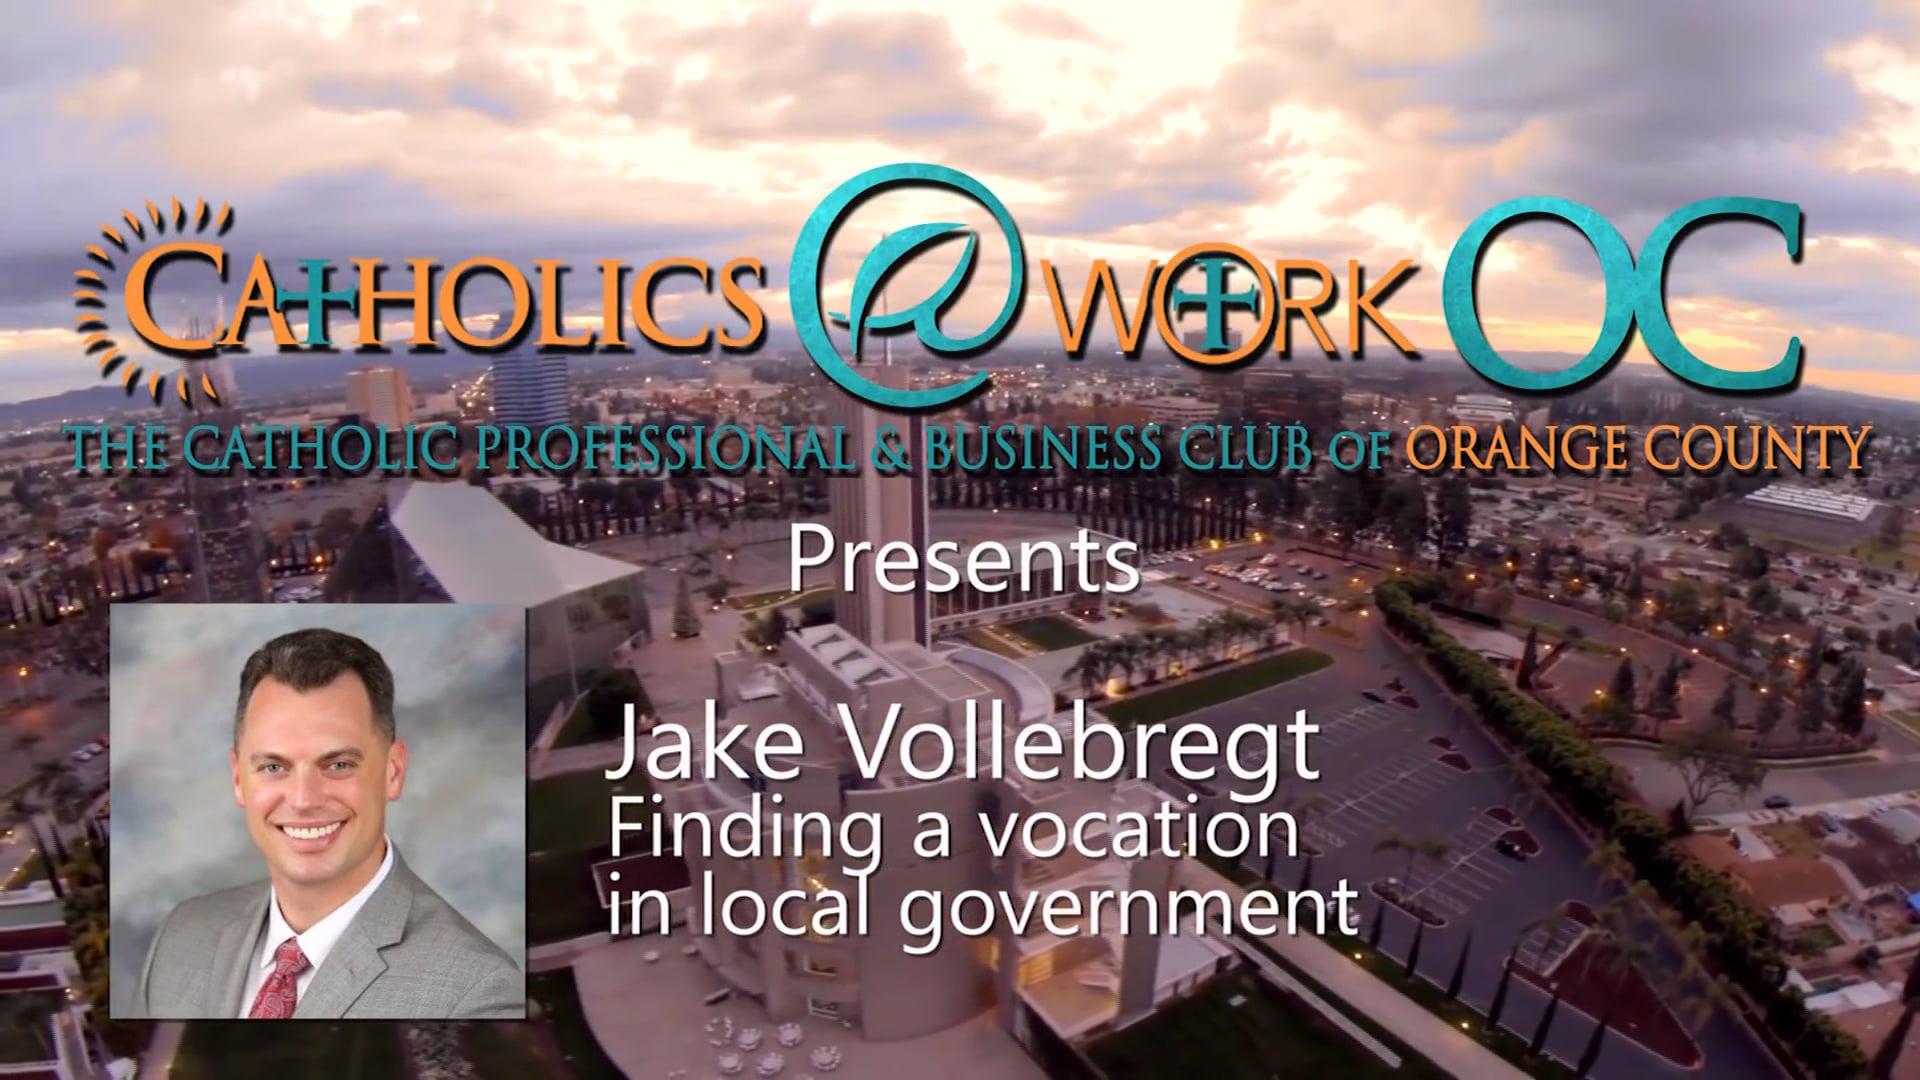 Jake Vollebregt